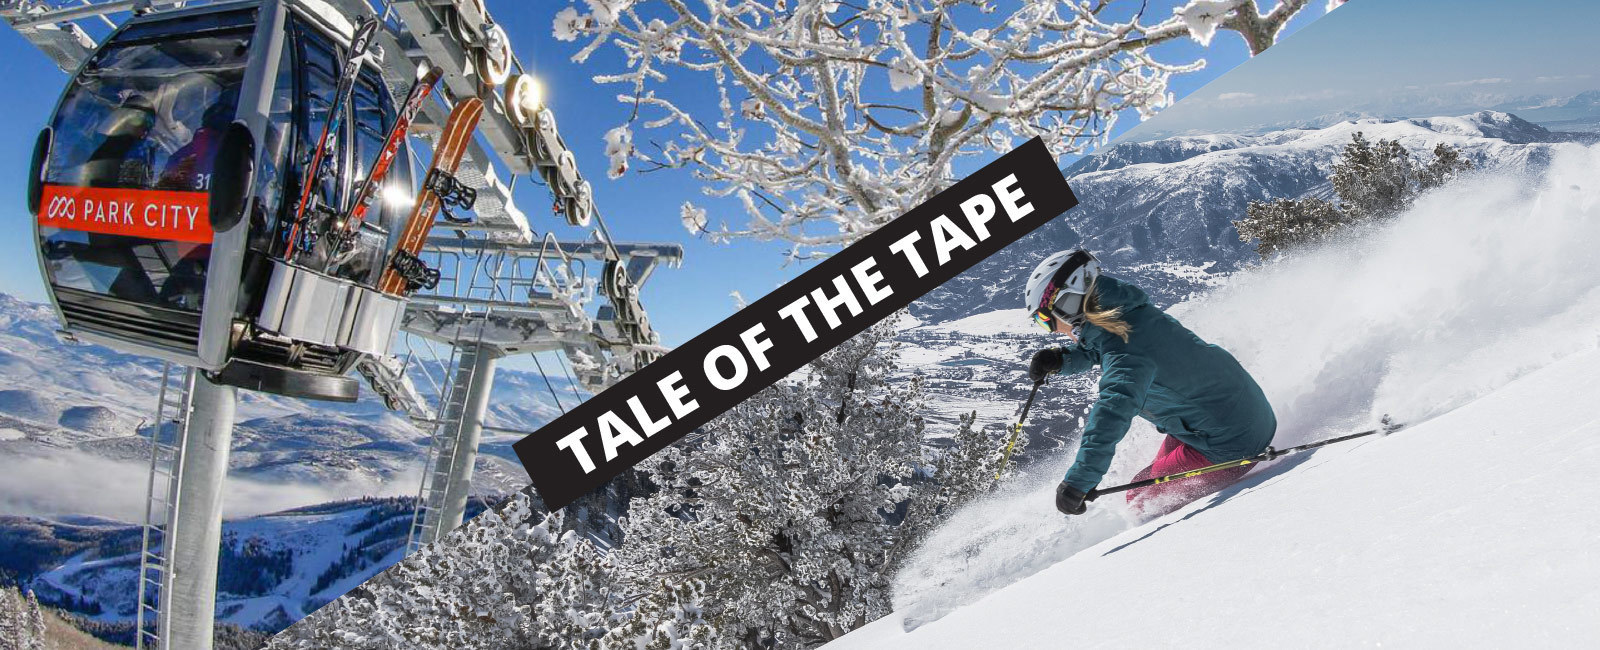 America's Two Largest Ski Resorts